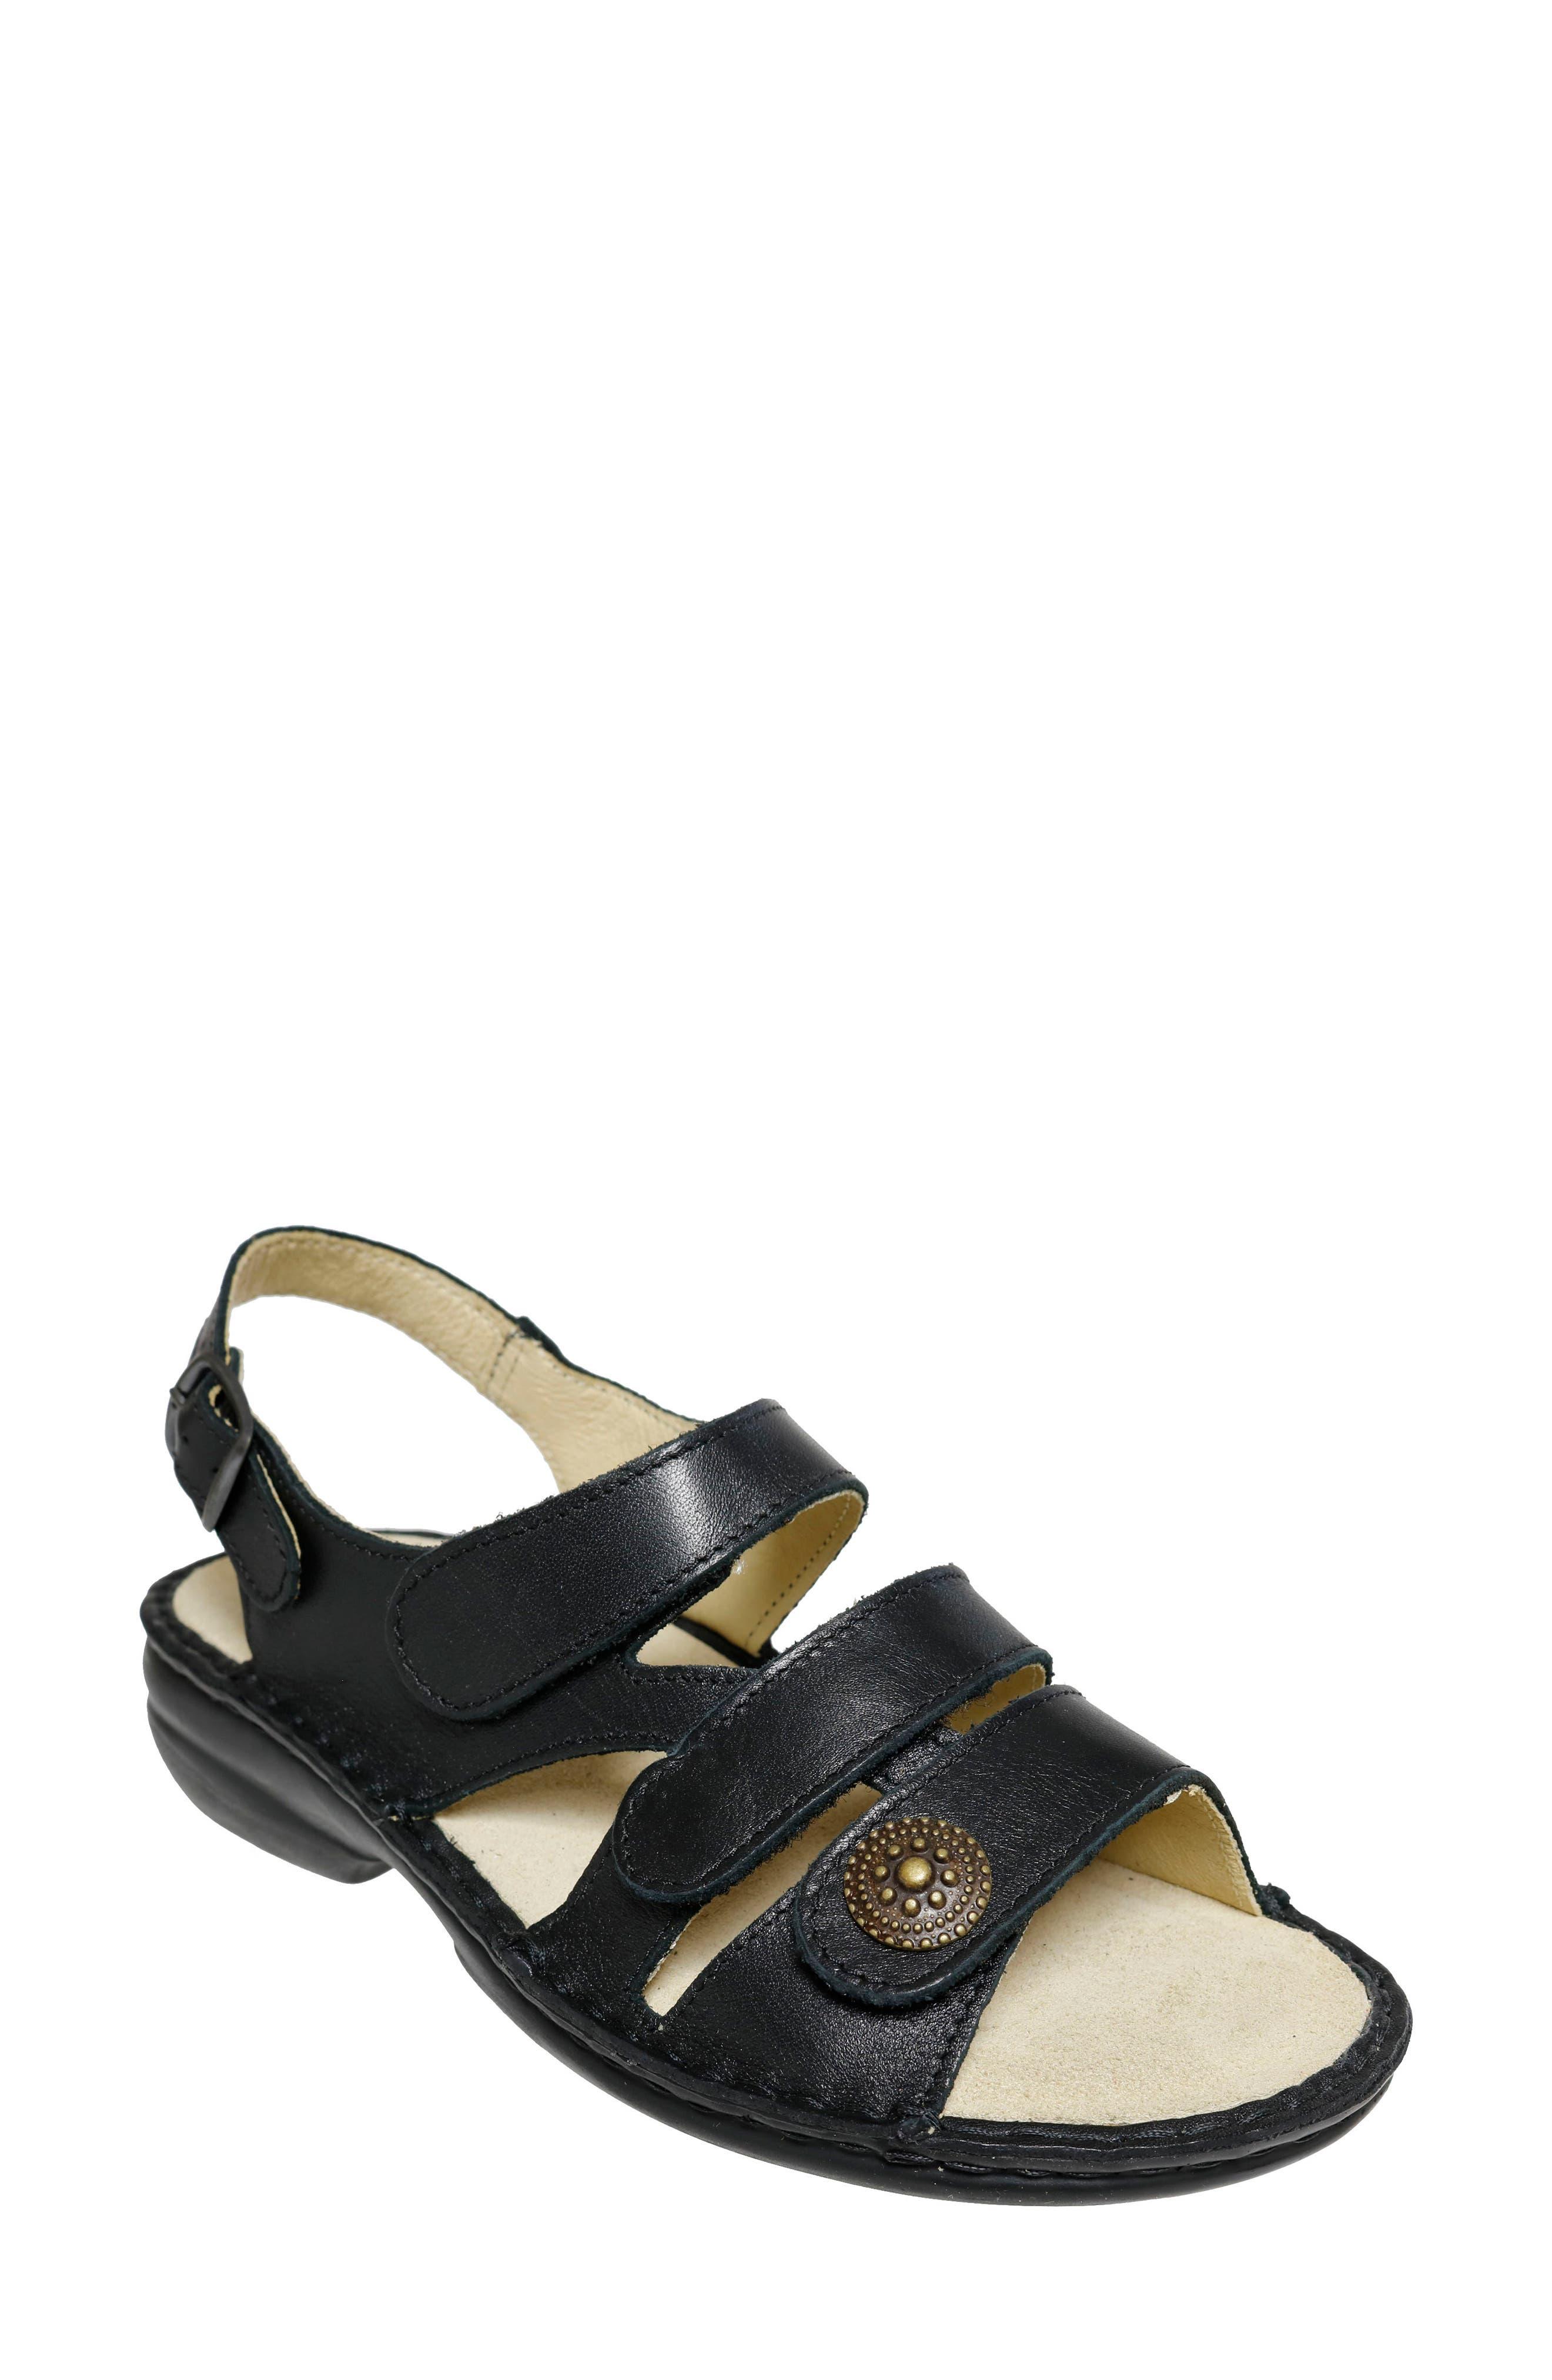 Wrap Slingback Sandal